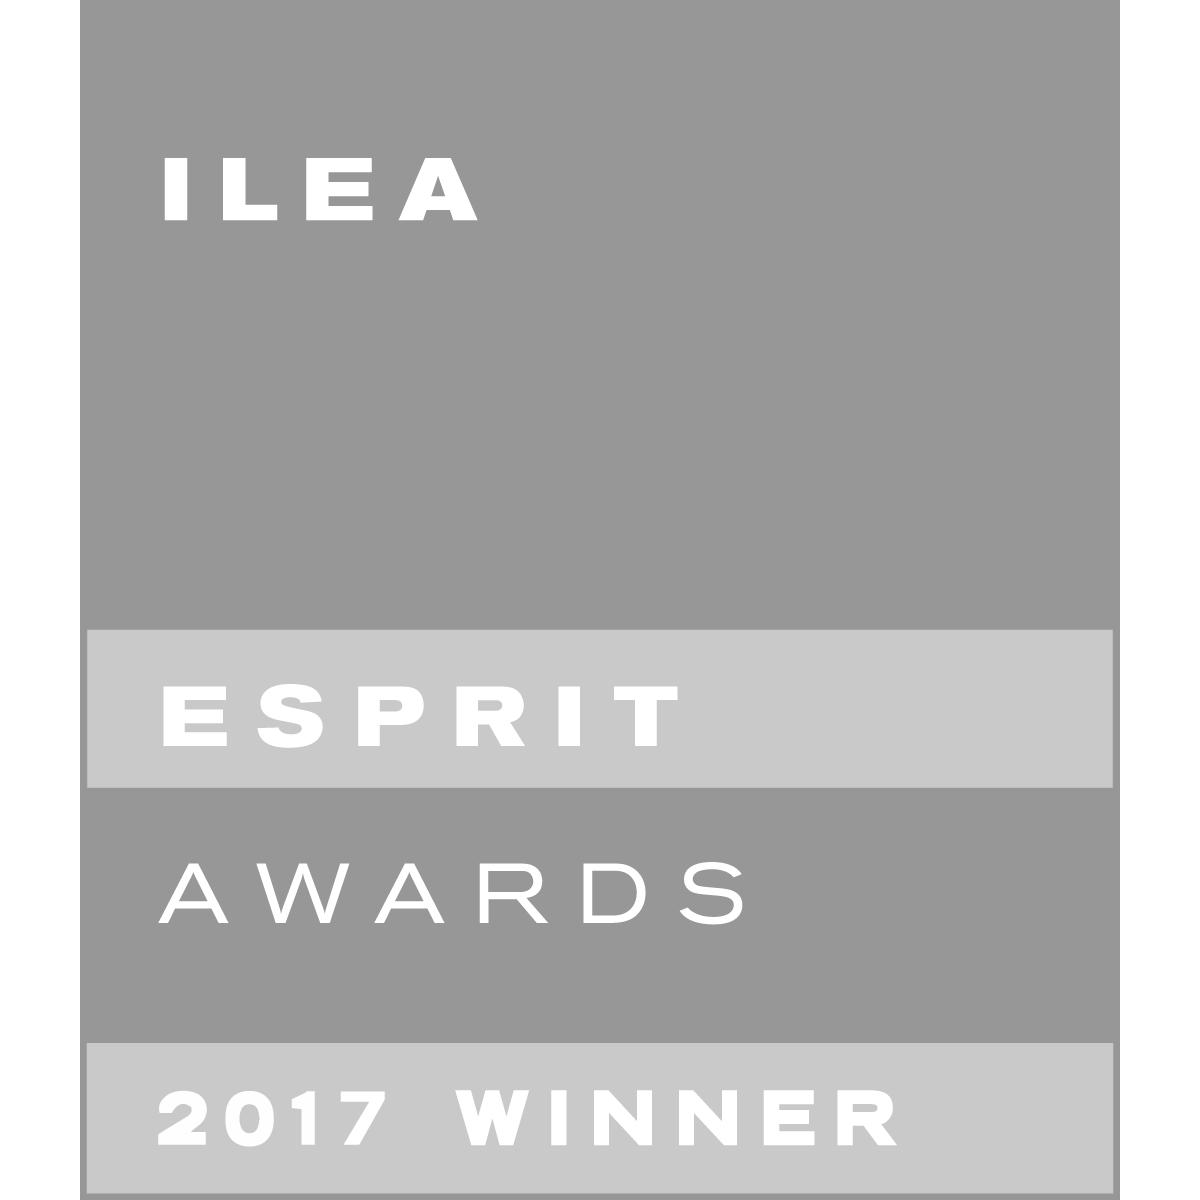 2017 ILEA Esprit Award Nominee — Best Industry Innovation